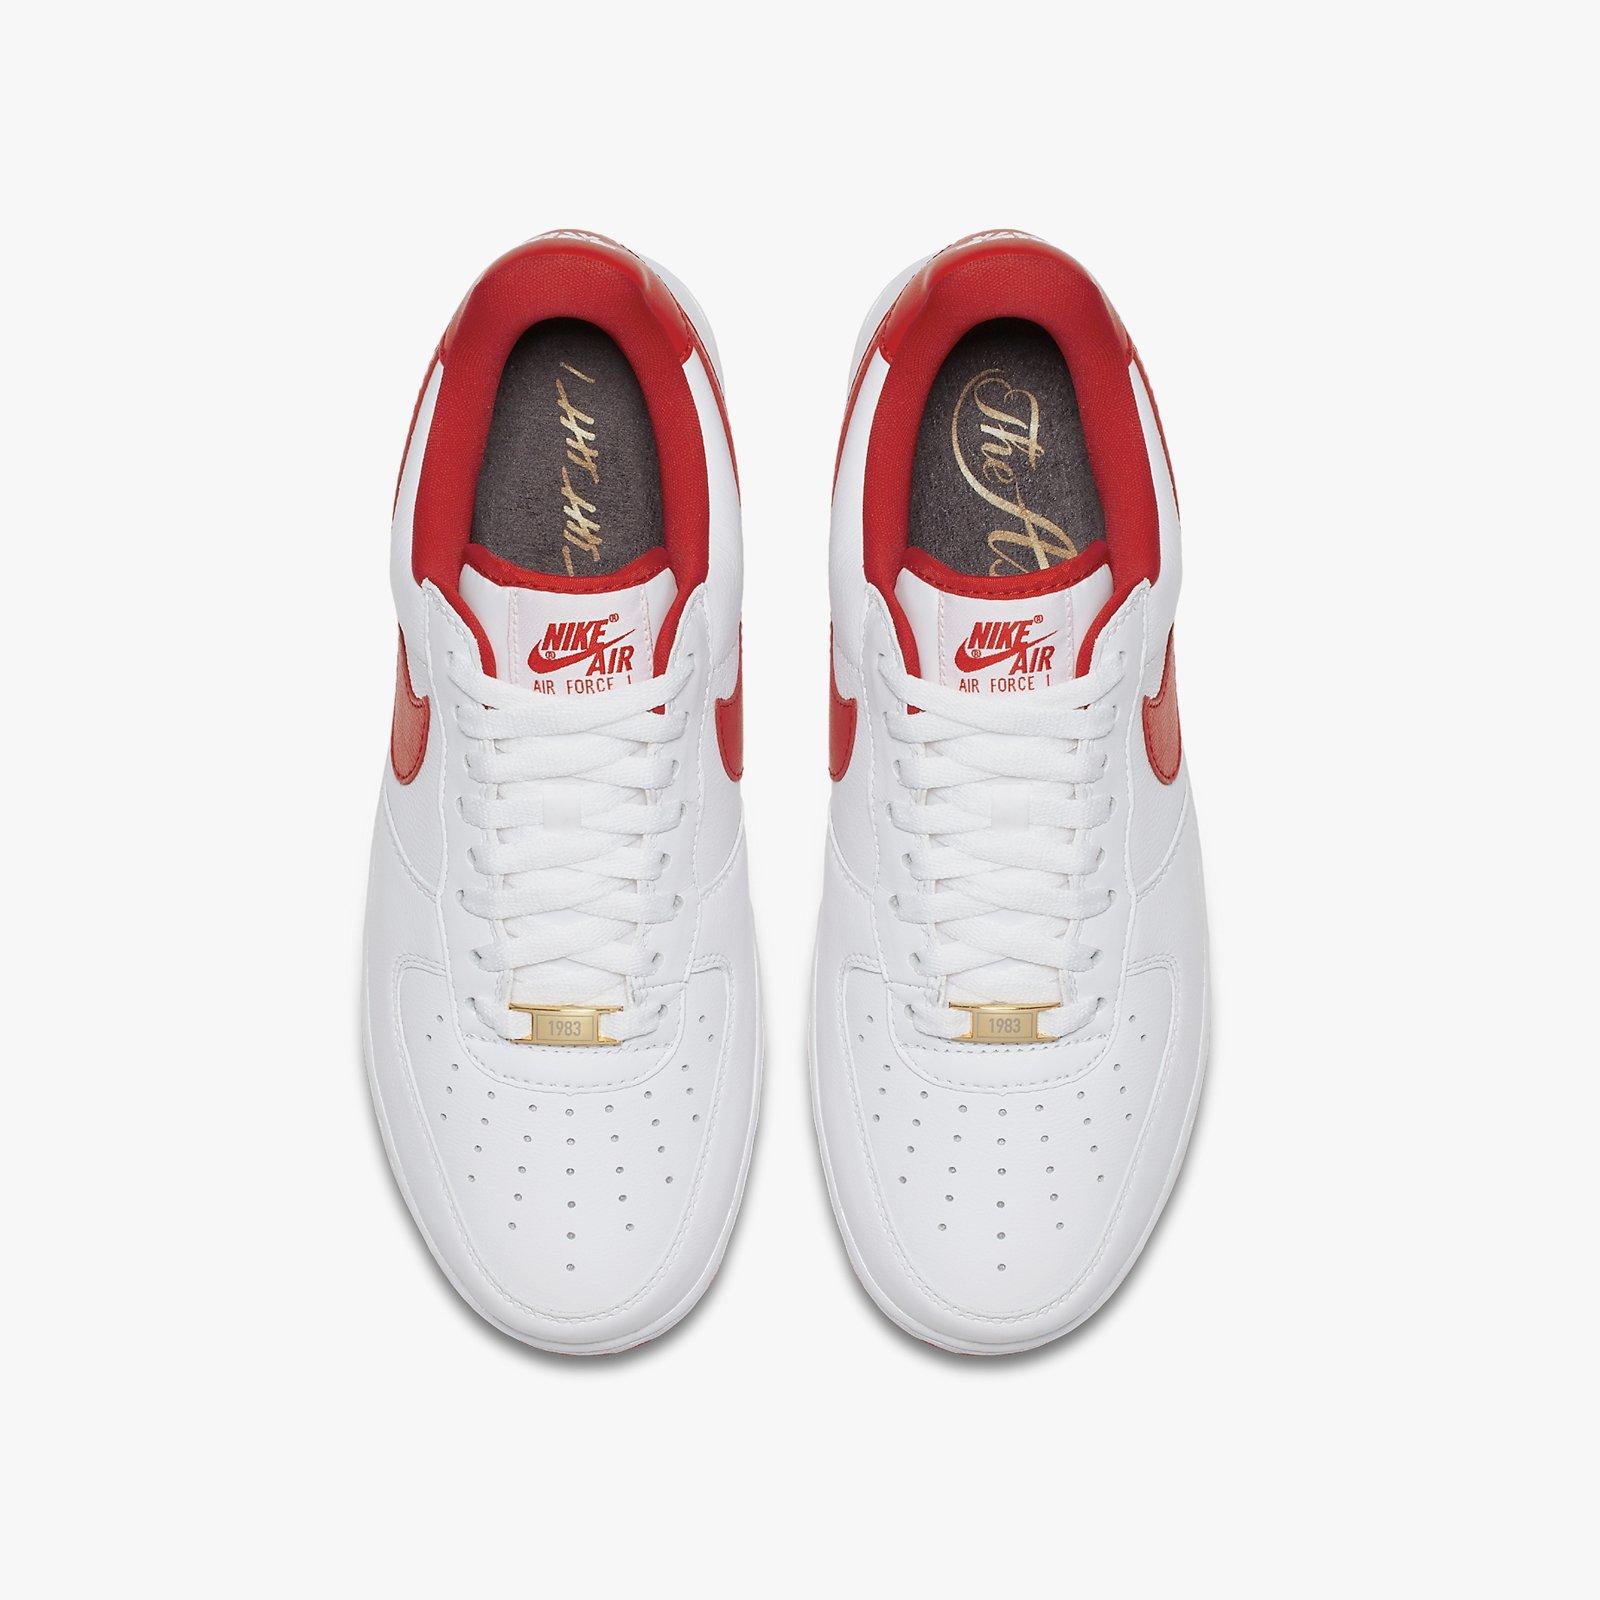 Force Air Sneakersnstuff Ct16 Qs Nike Low Retro 100 Aq5107 1 PkZilTwuOX